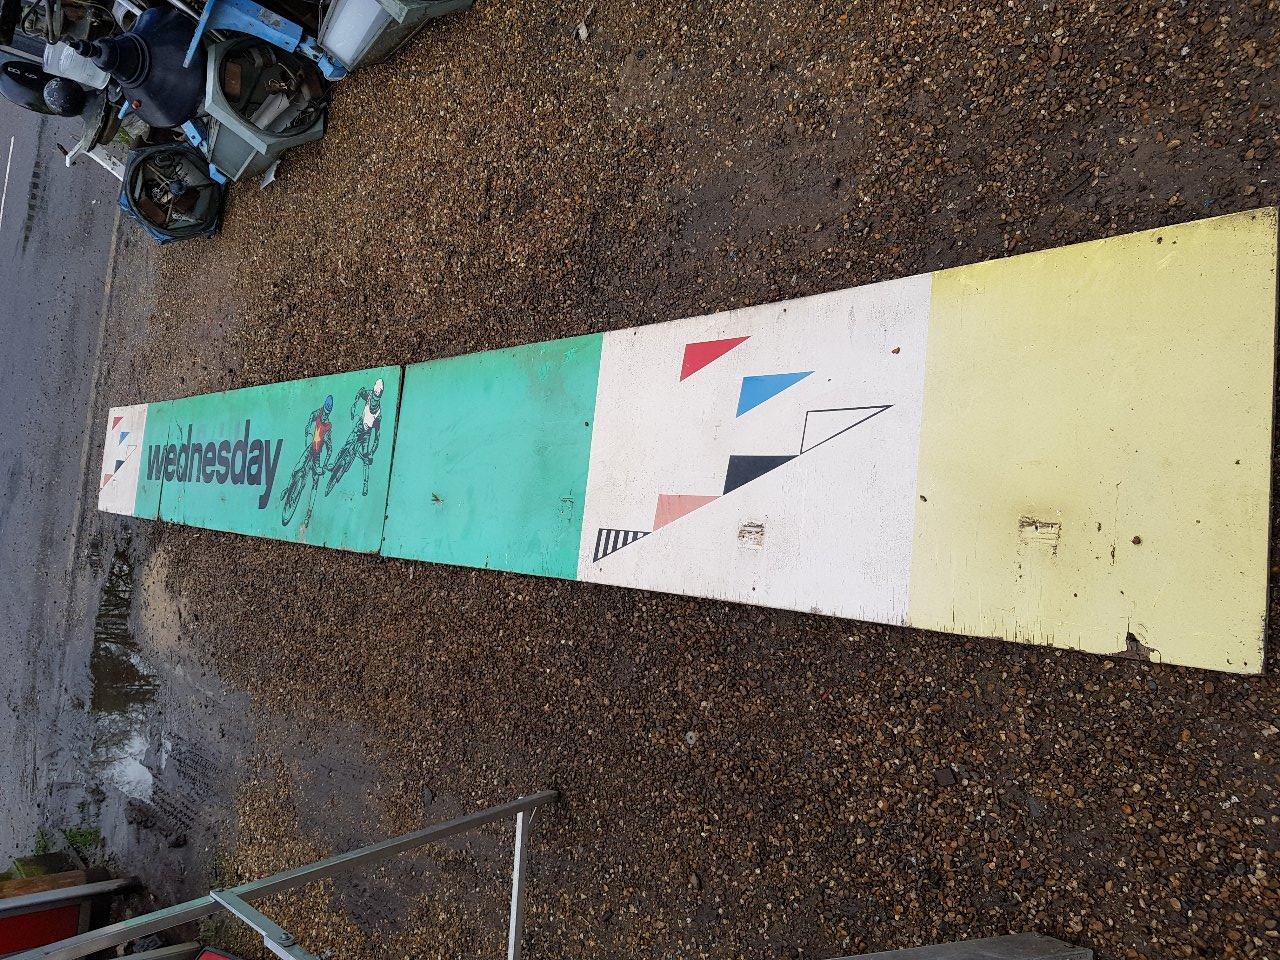 Wimbledon Stadium, Speedway Sign